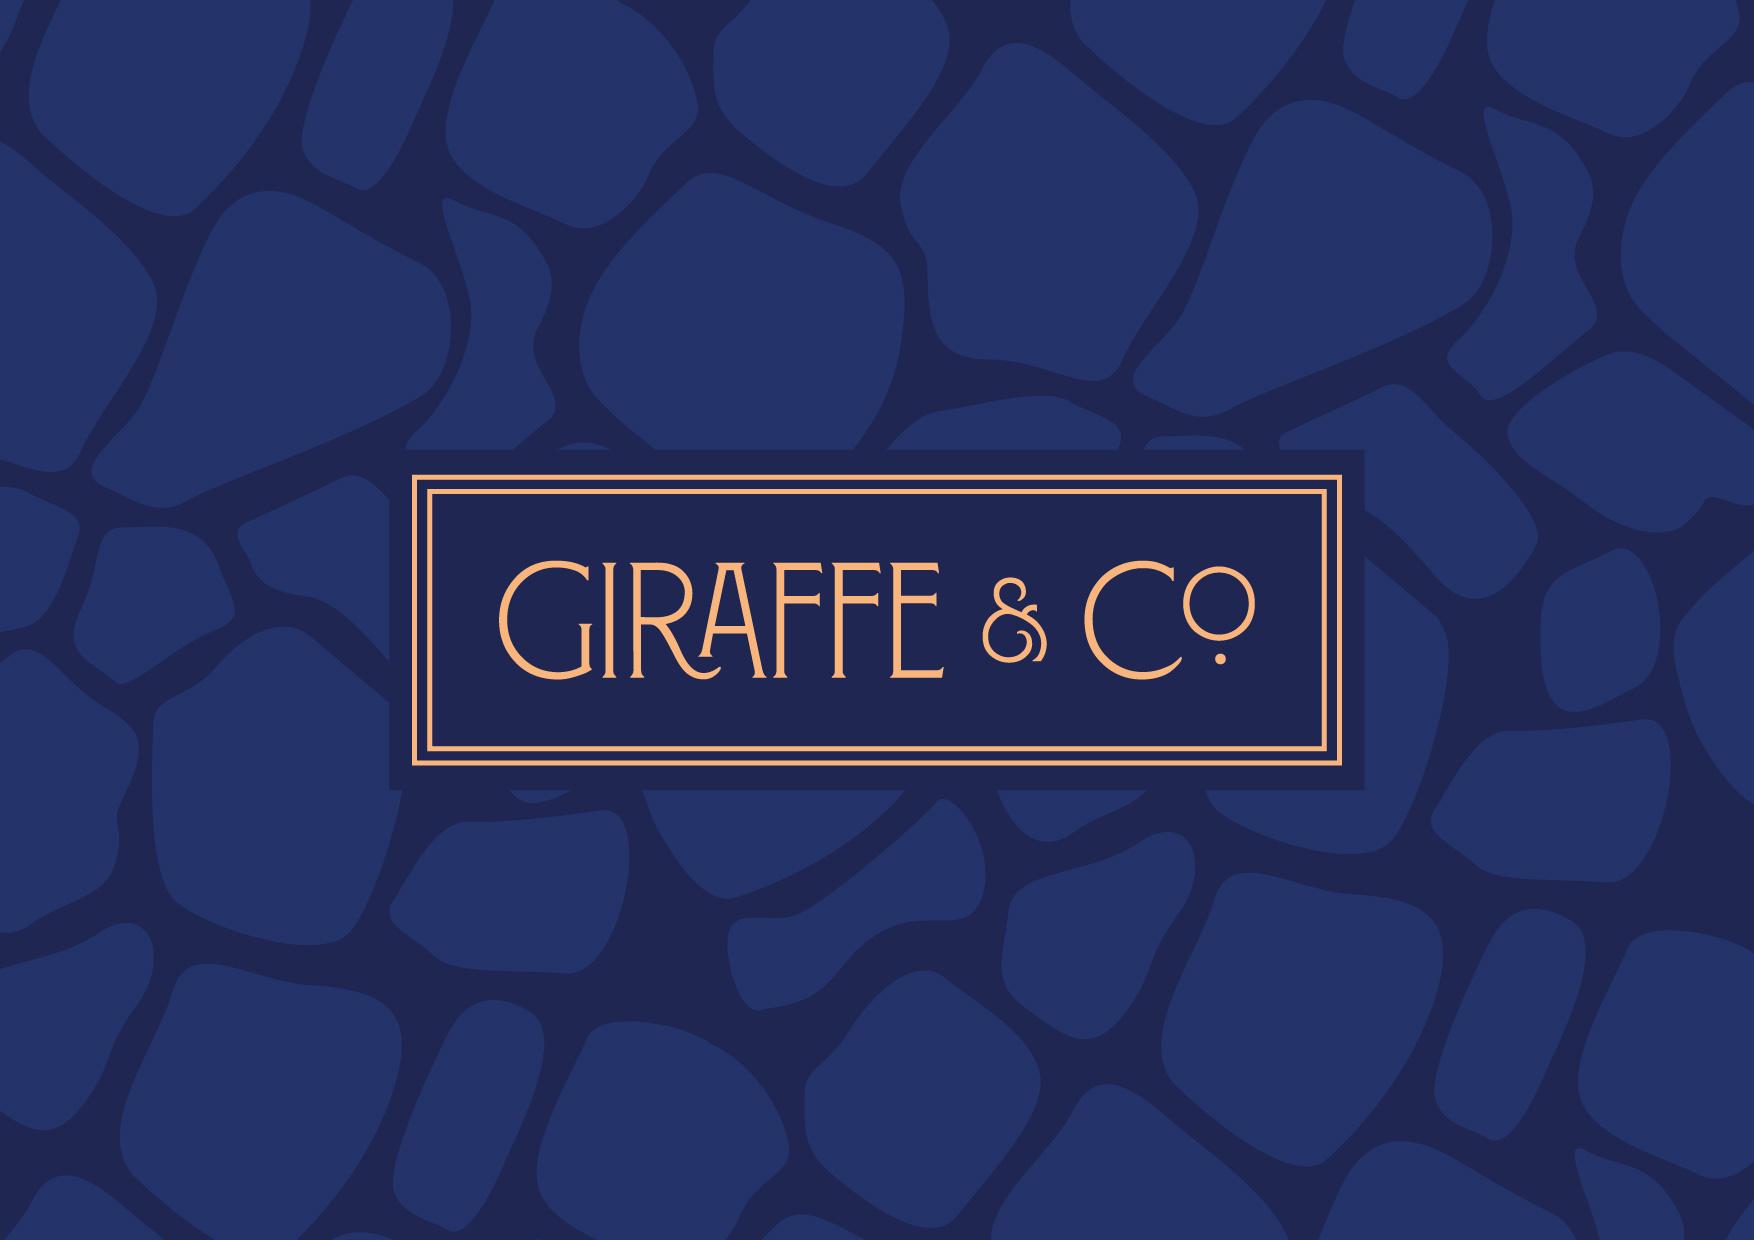 giraffeco-branding-final-09